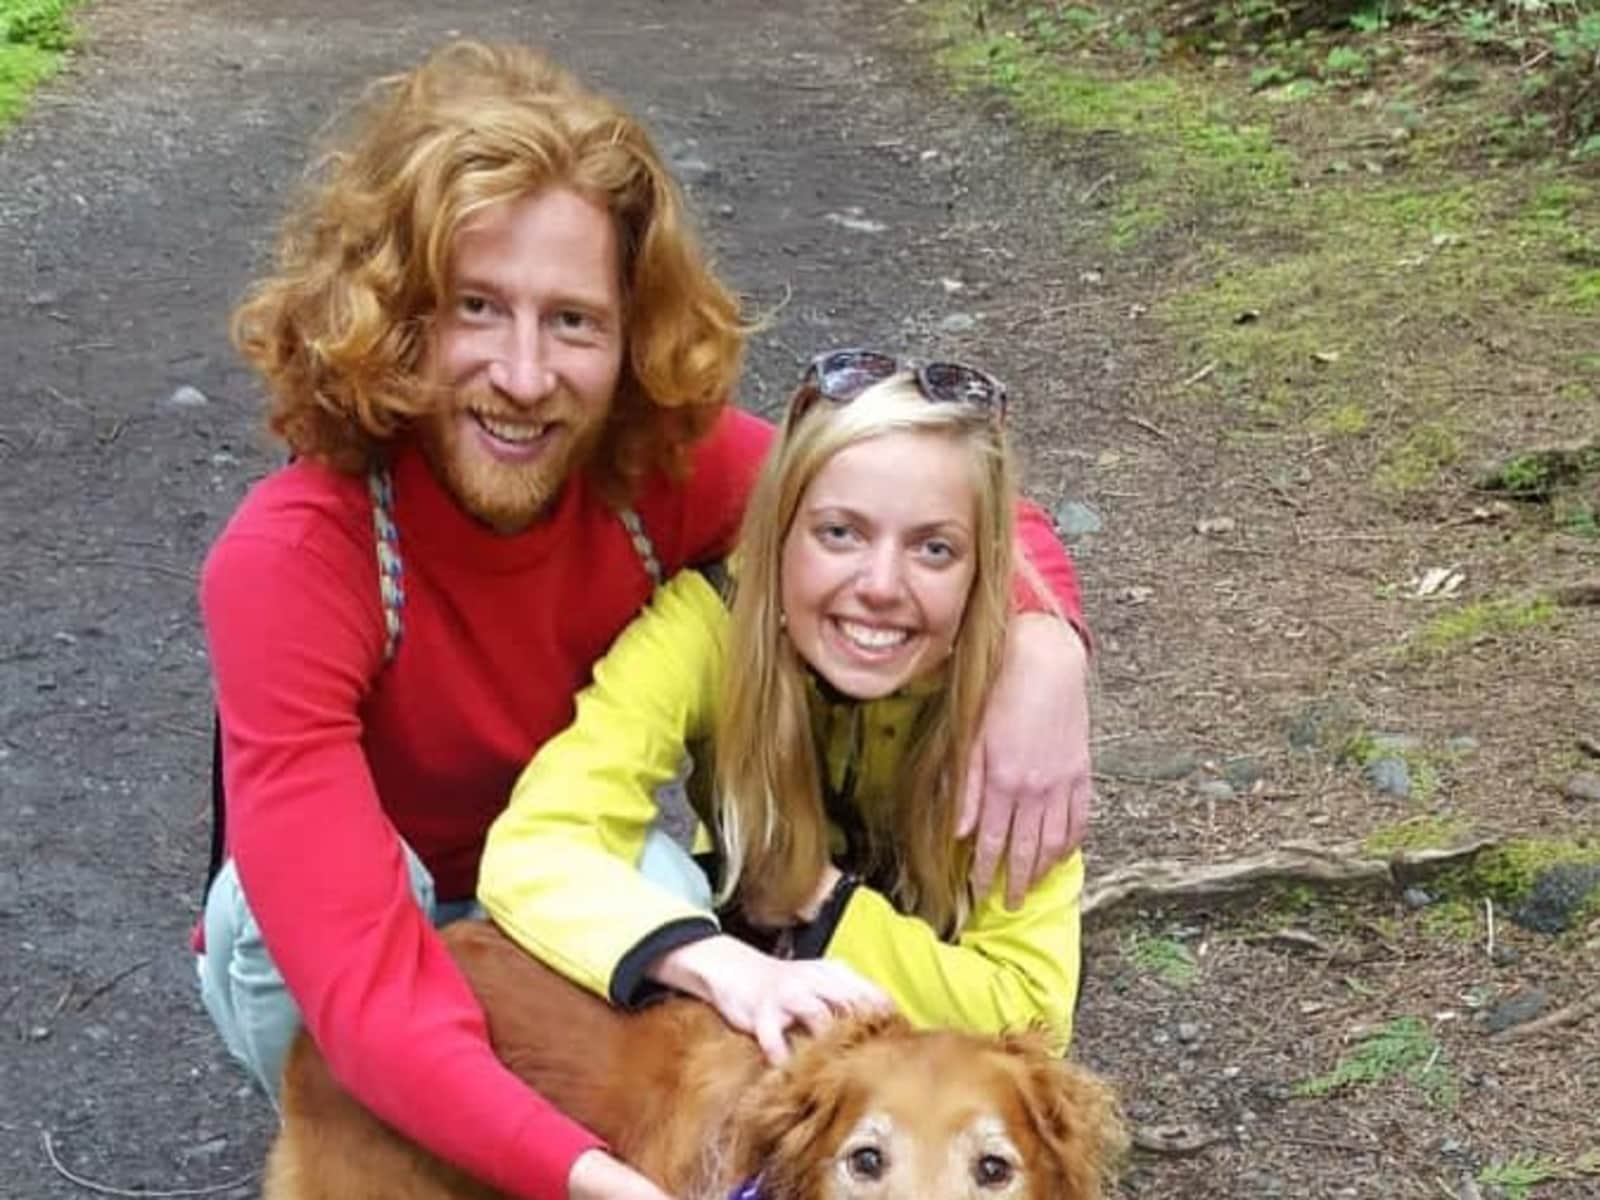 Radek & Veronika from Seattle, Washington, United States